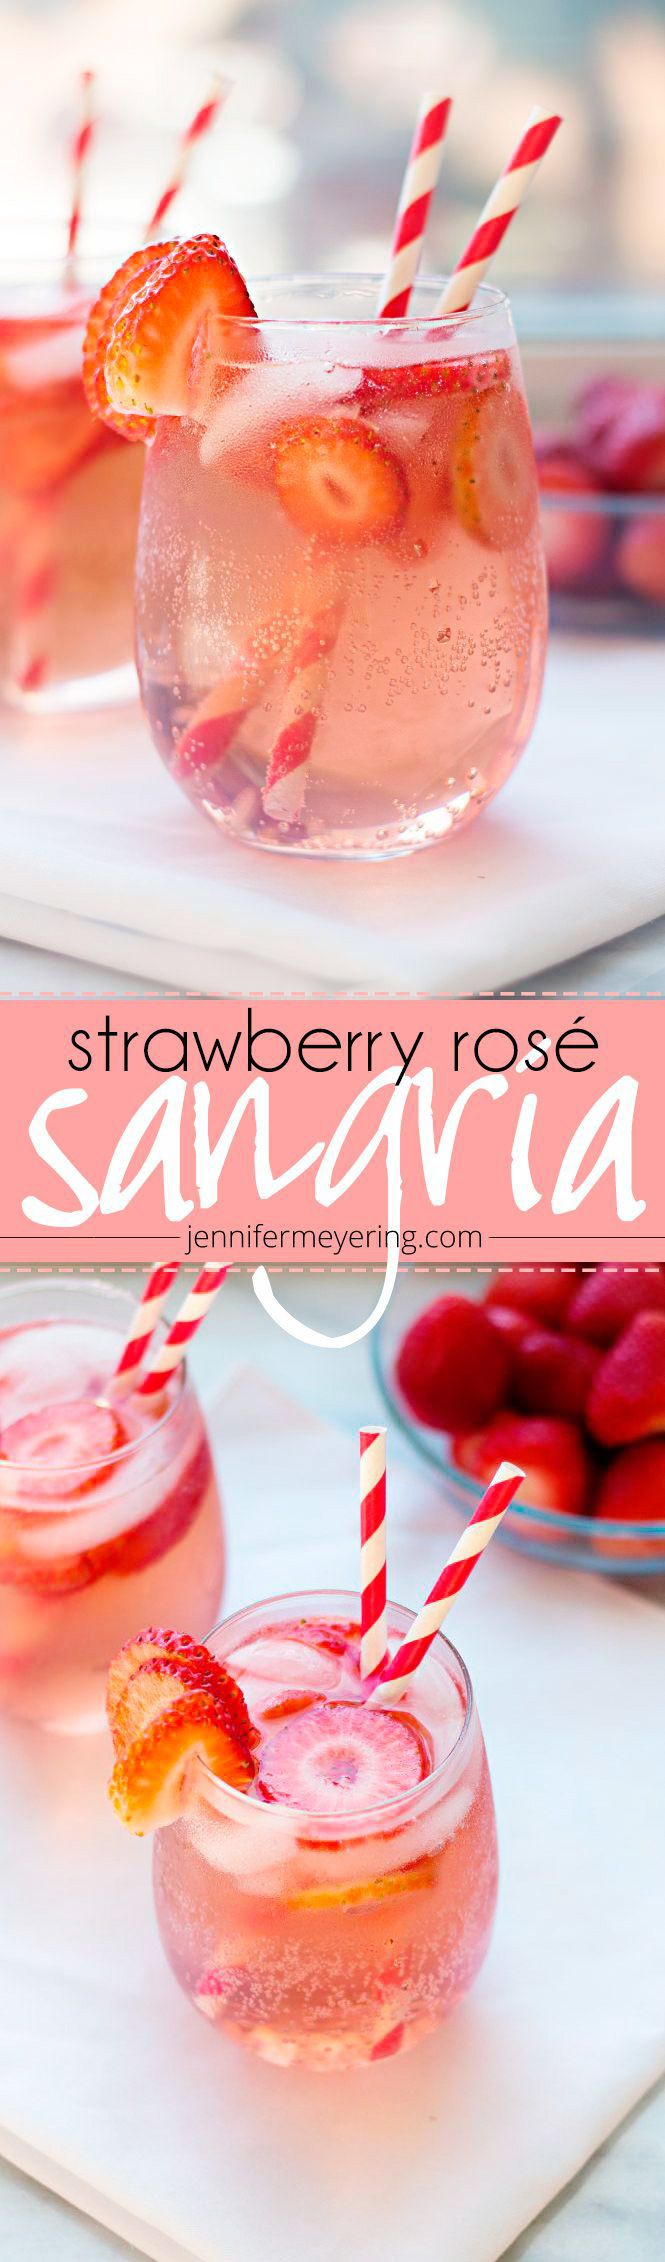 strawberry ros sangria cocktail recipes pinterest getr nke. Black Bedroom Furniture Sets. Home Design Ideas